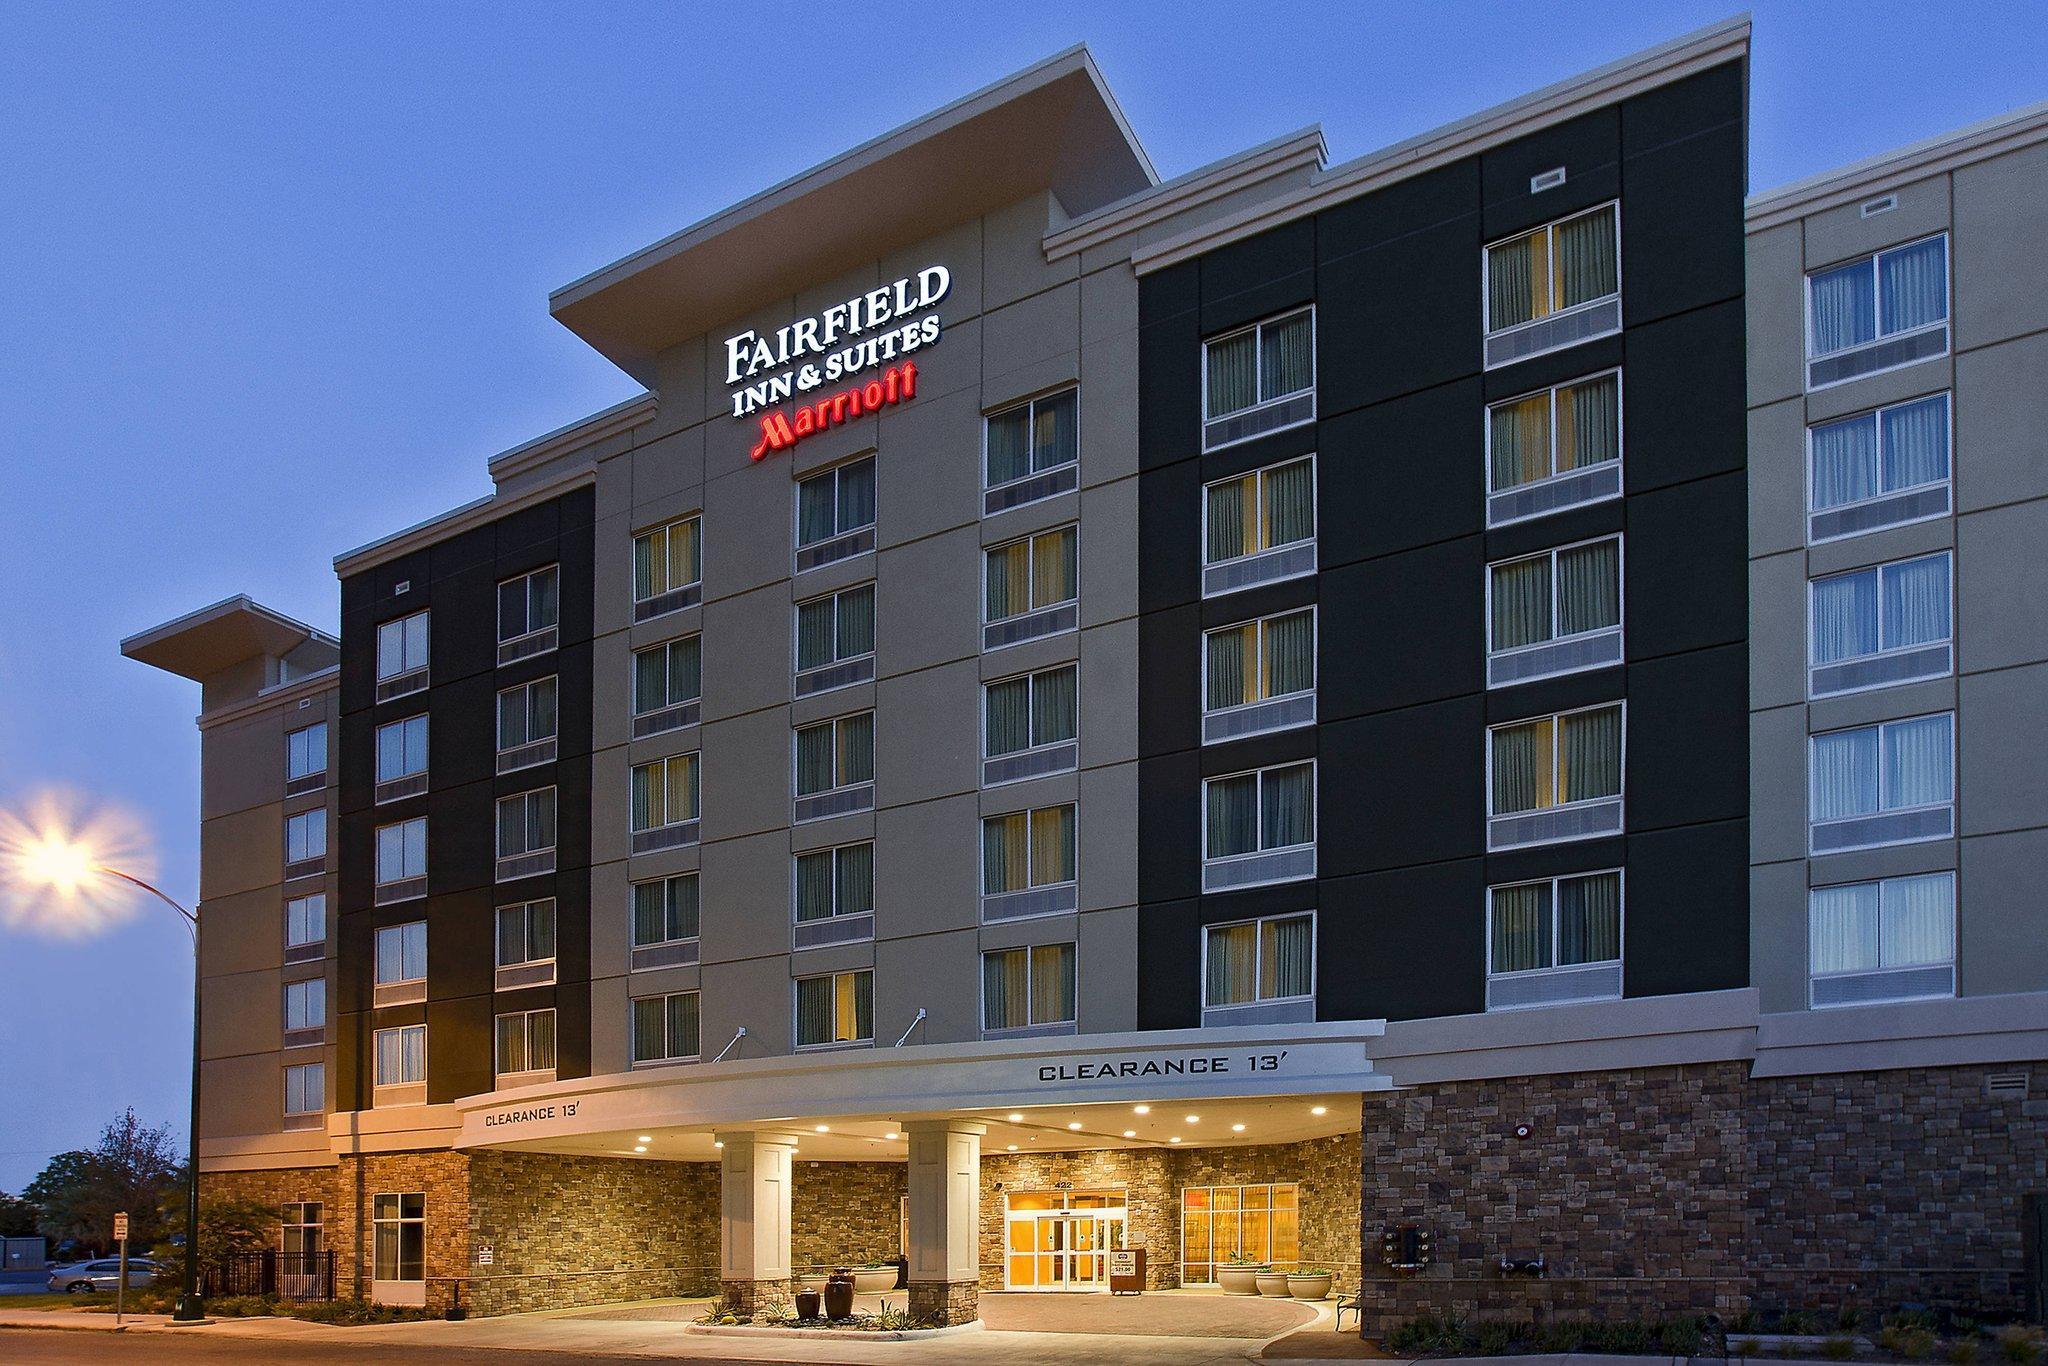 Fairfield Inn And Suites San Antonio Alamo Plaza Convention Center